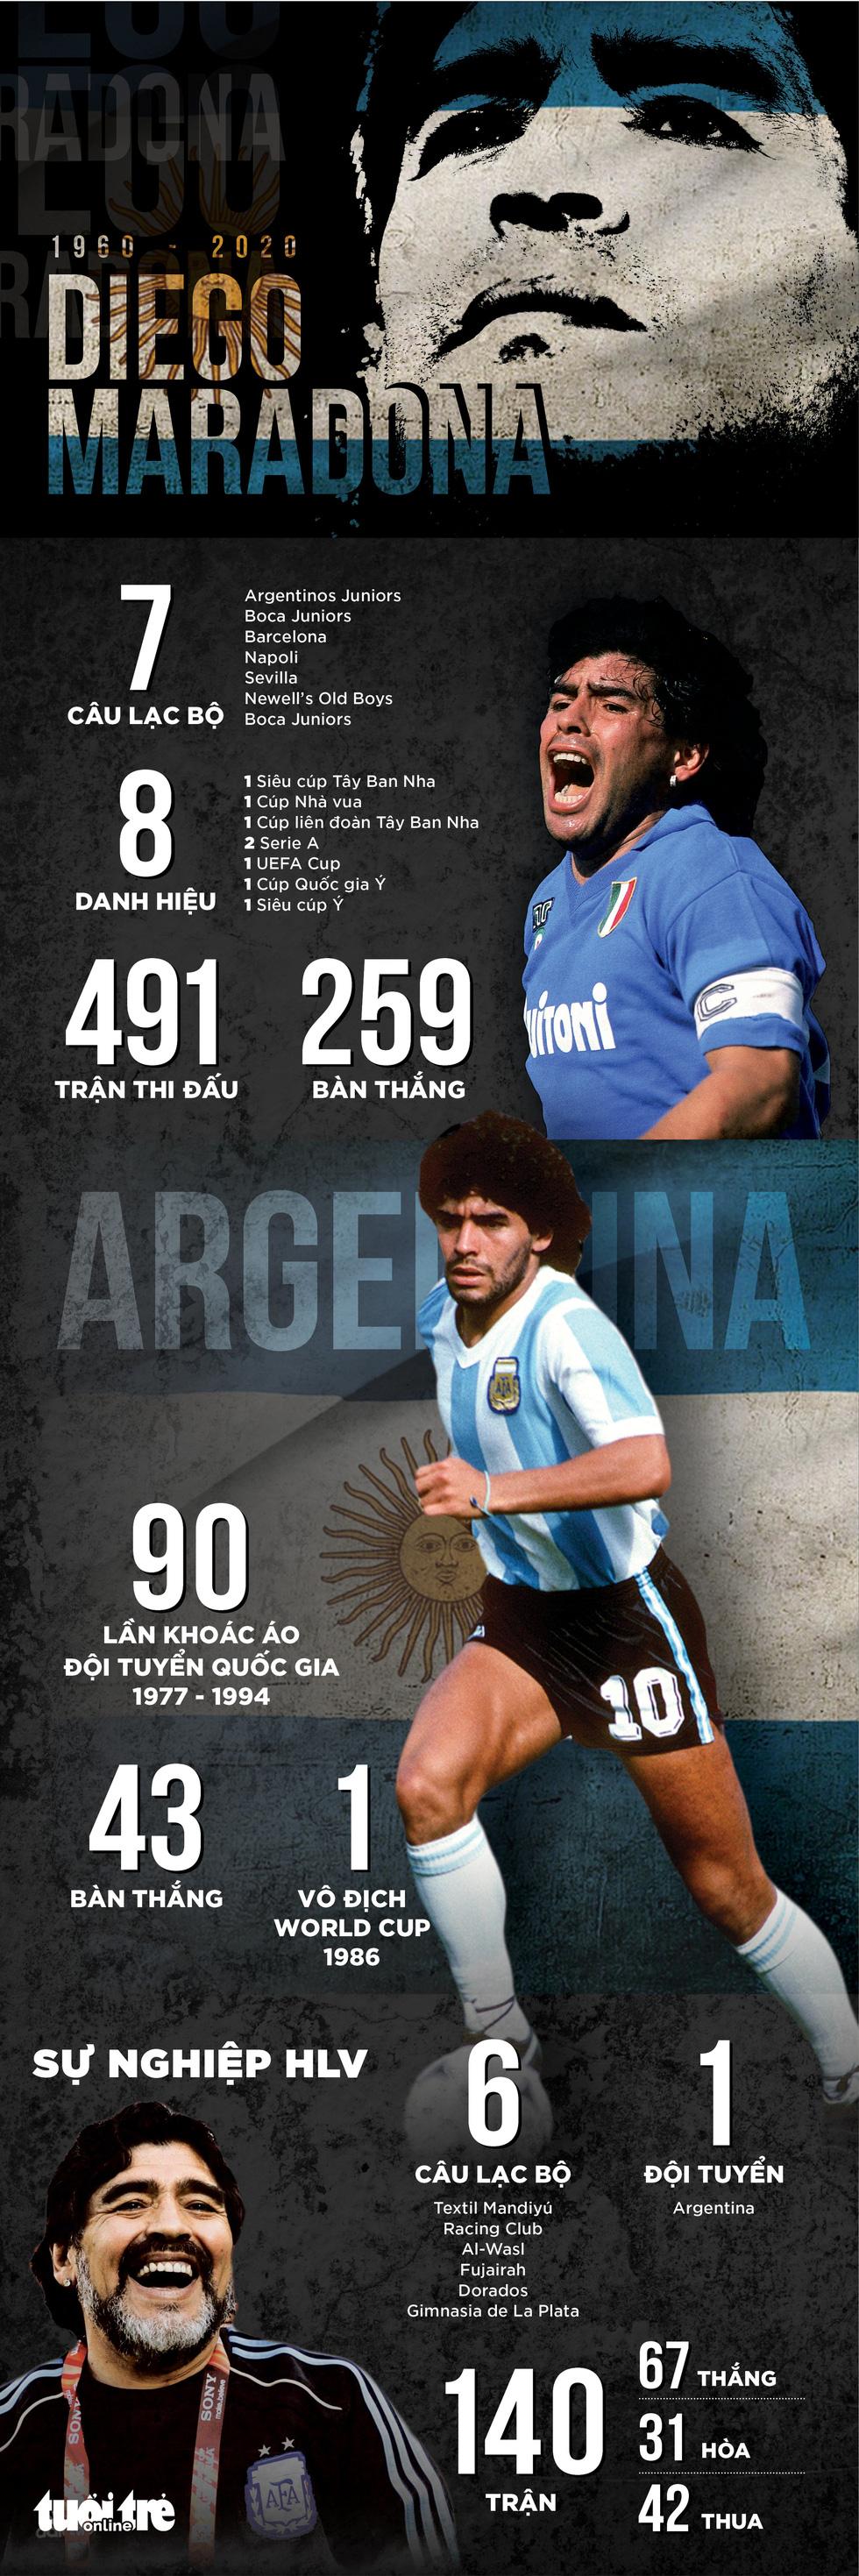 Sự nghiệp Maradona qua những con số - Ảnh 1.